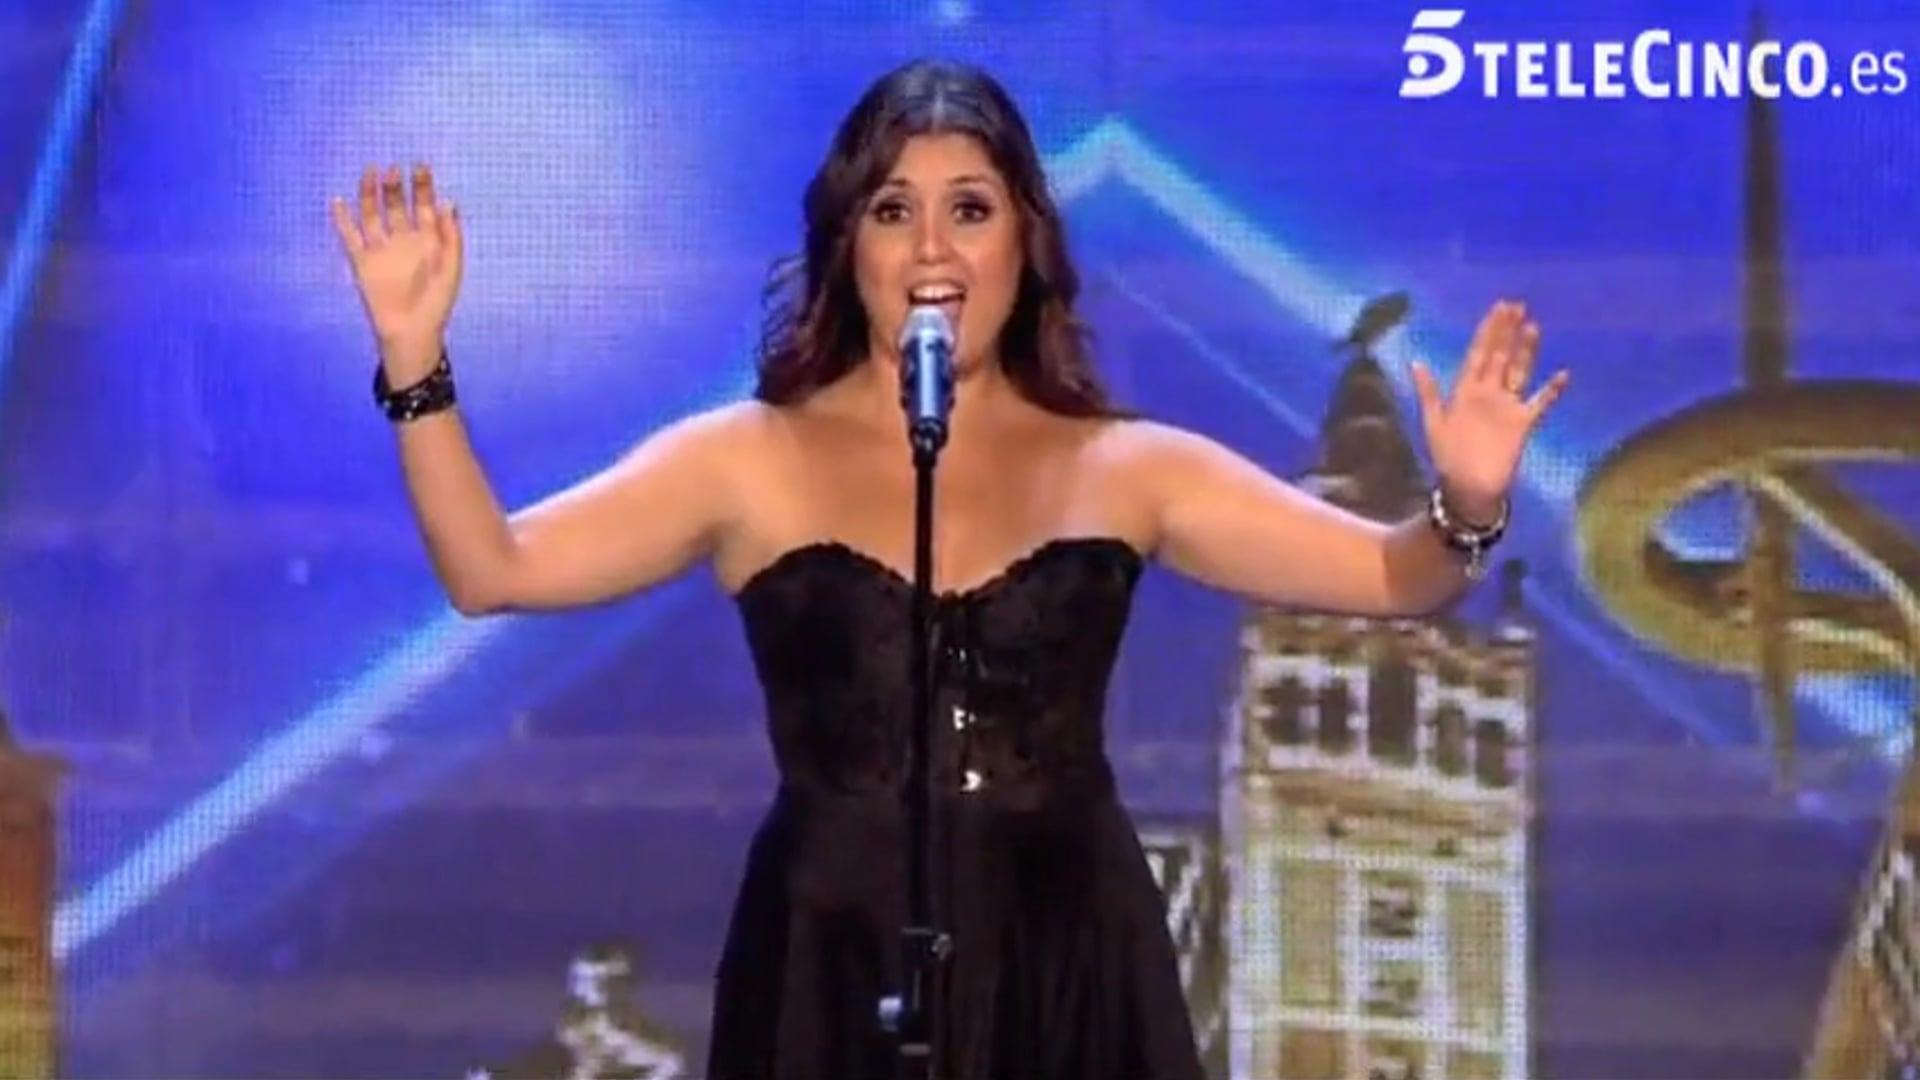 Cristina Ramos - Got Talent España (Highway to Hell)